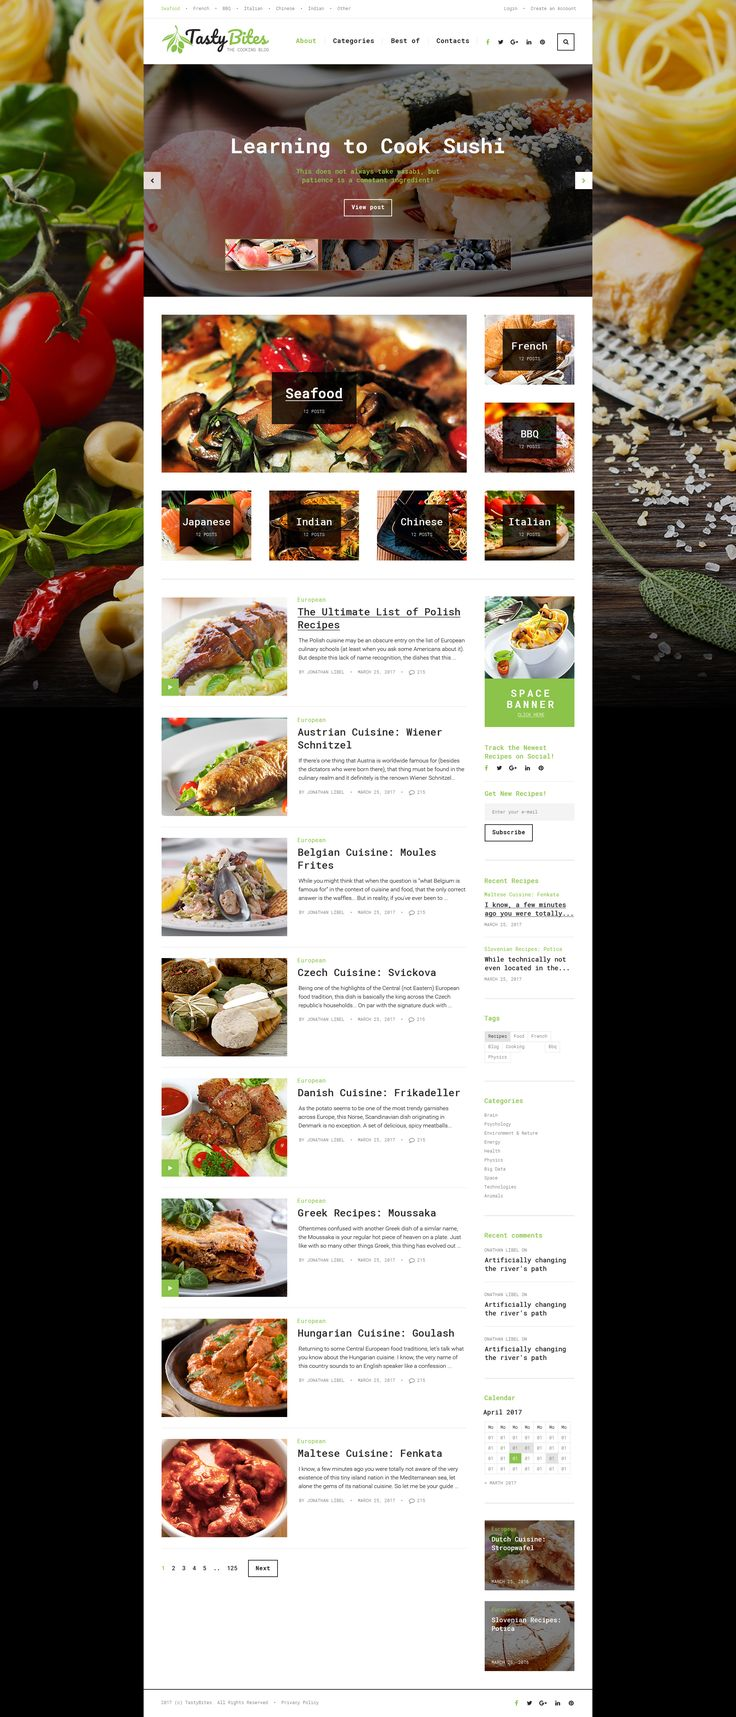 Food And Beverages WP Theme - https://www.templatemonster.com/wordpress-themes/62036.html  #wordpress #wordpresstheme #responsive  https://www.templatemonster.com/wordpress-themes/gutenberg-beer-pub-and-brewery-wordpress-theme-59005.html